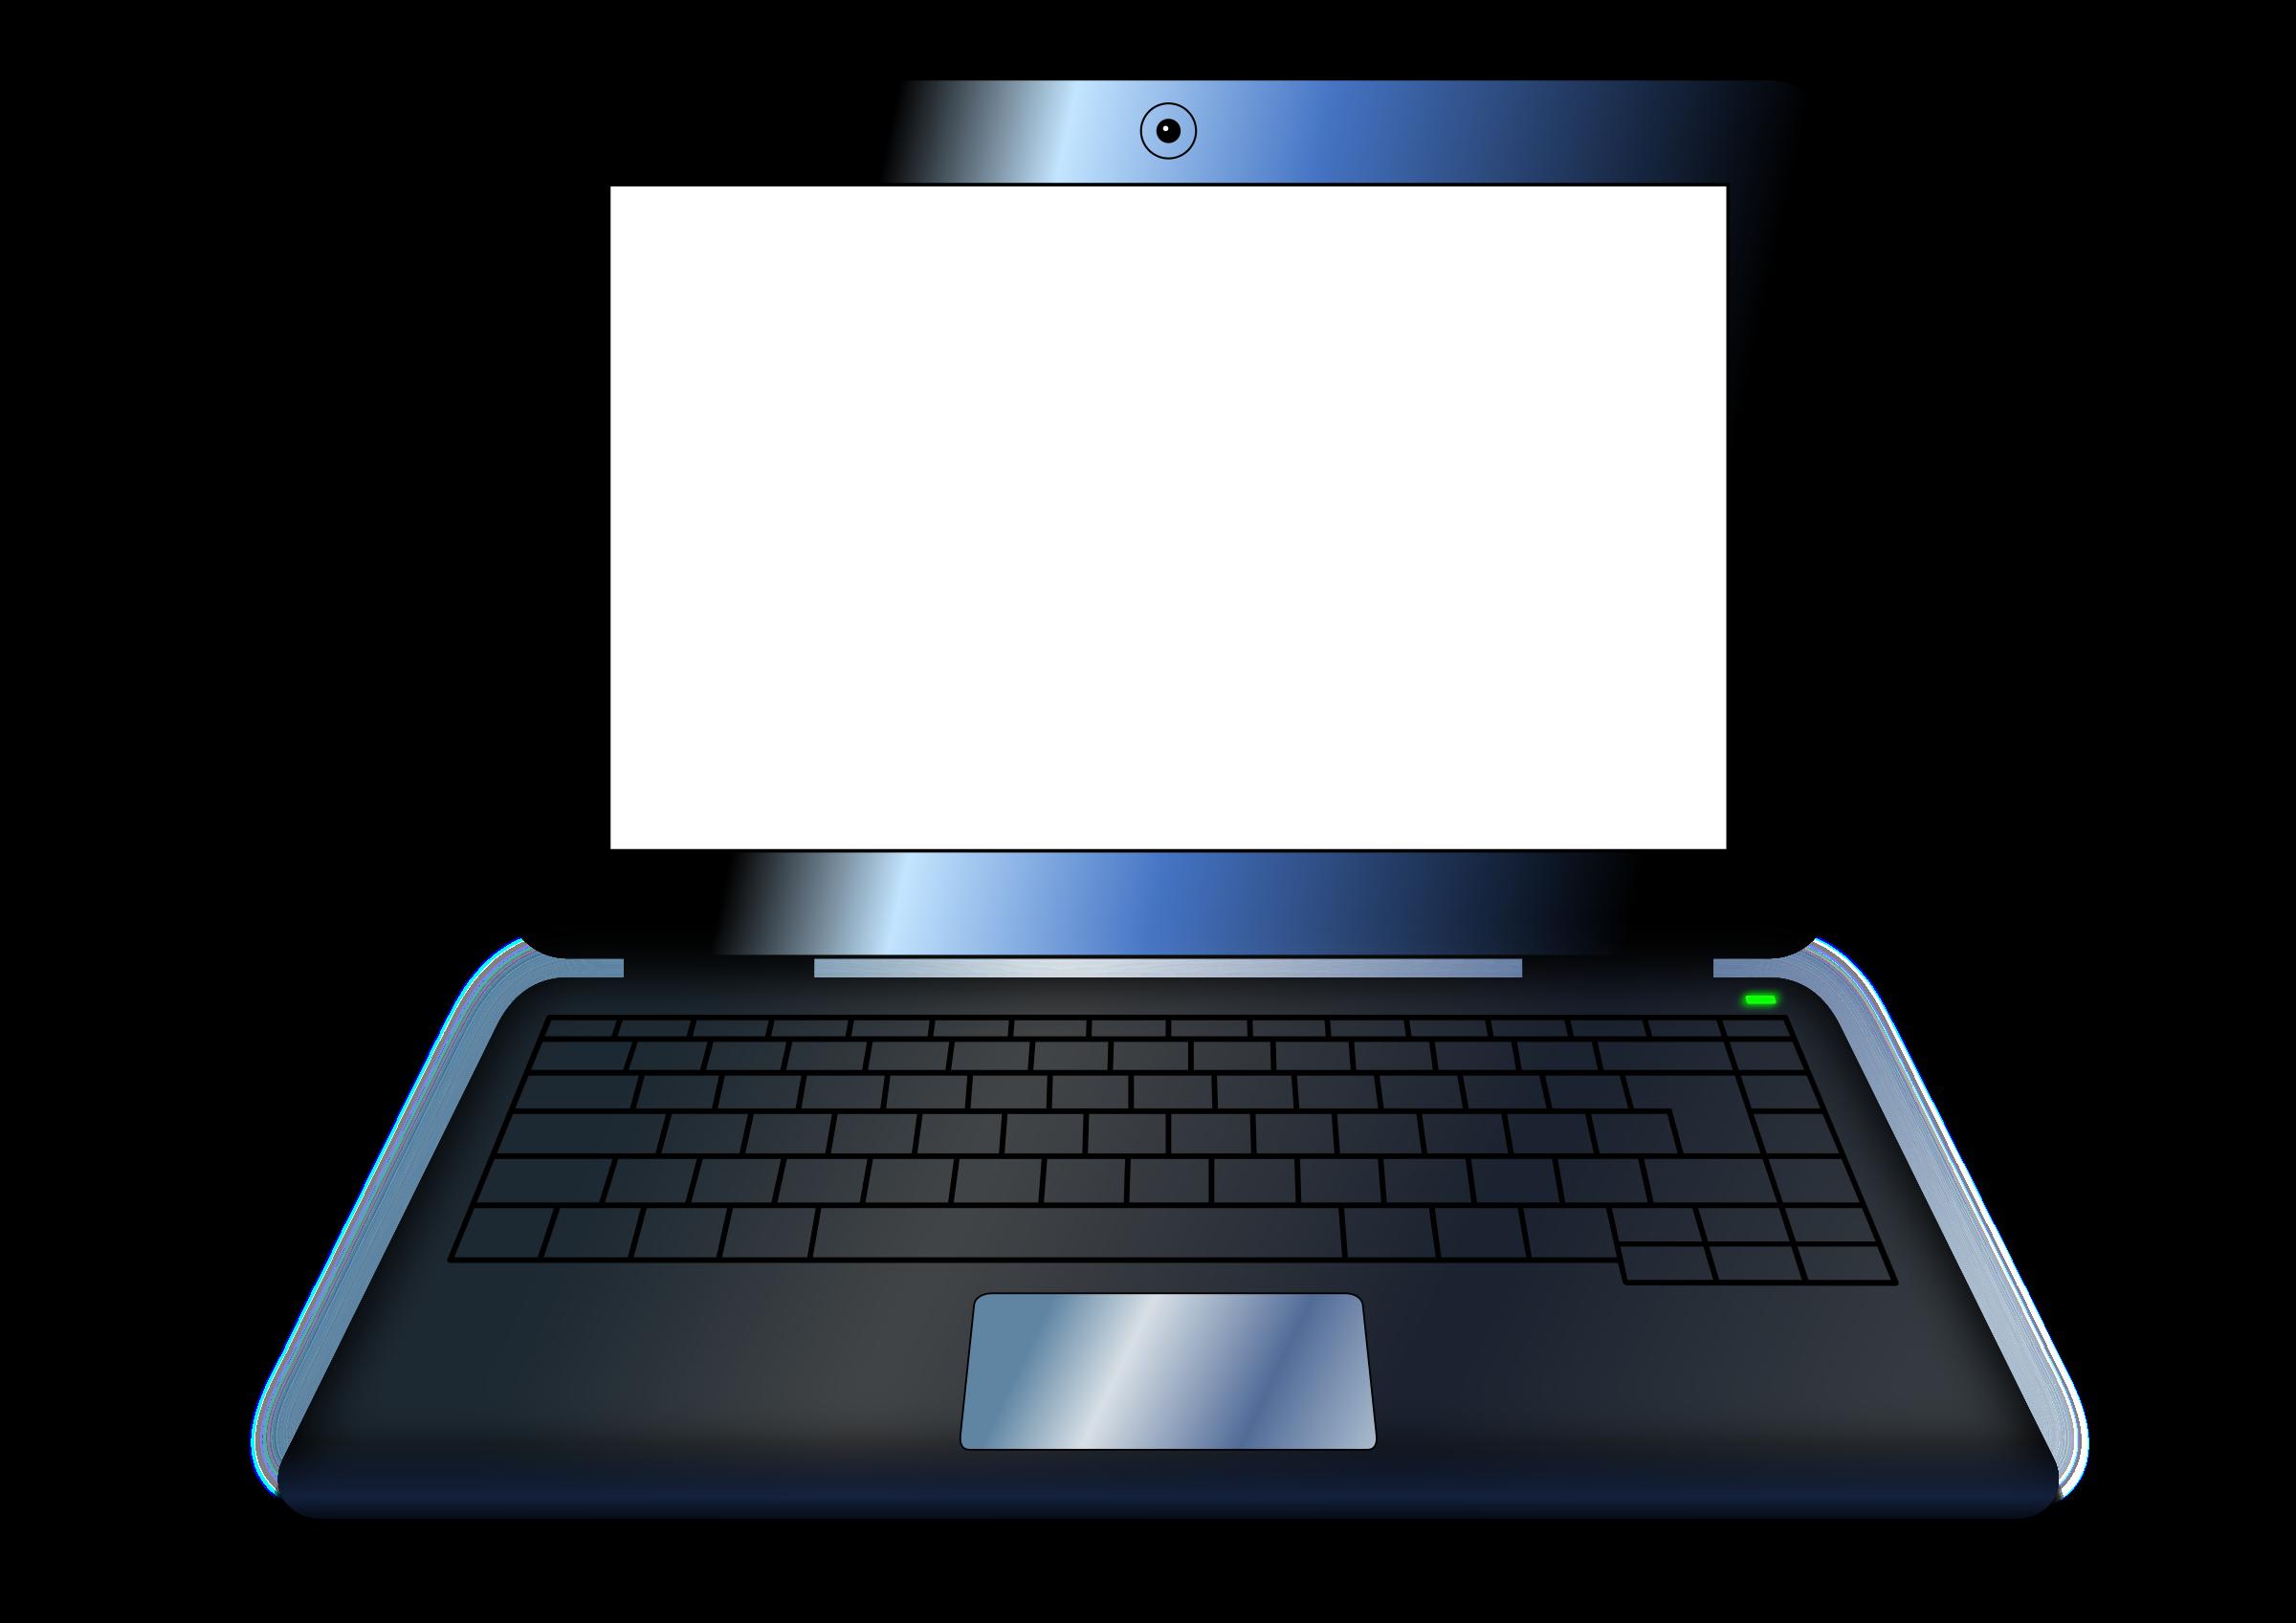 Laptop clipart chromebook, Laptop chromebook Transparent.